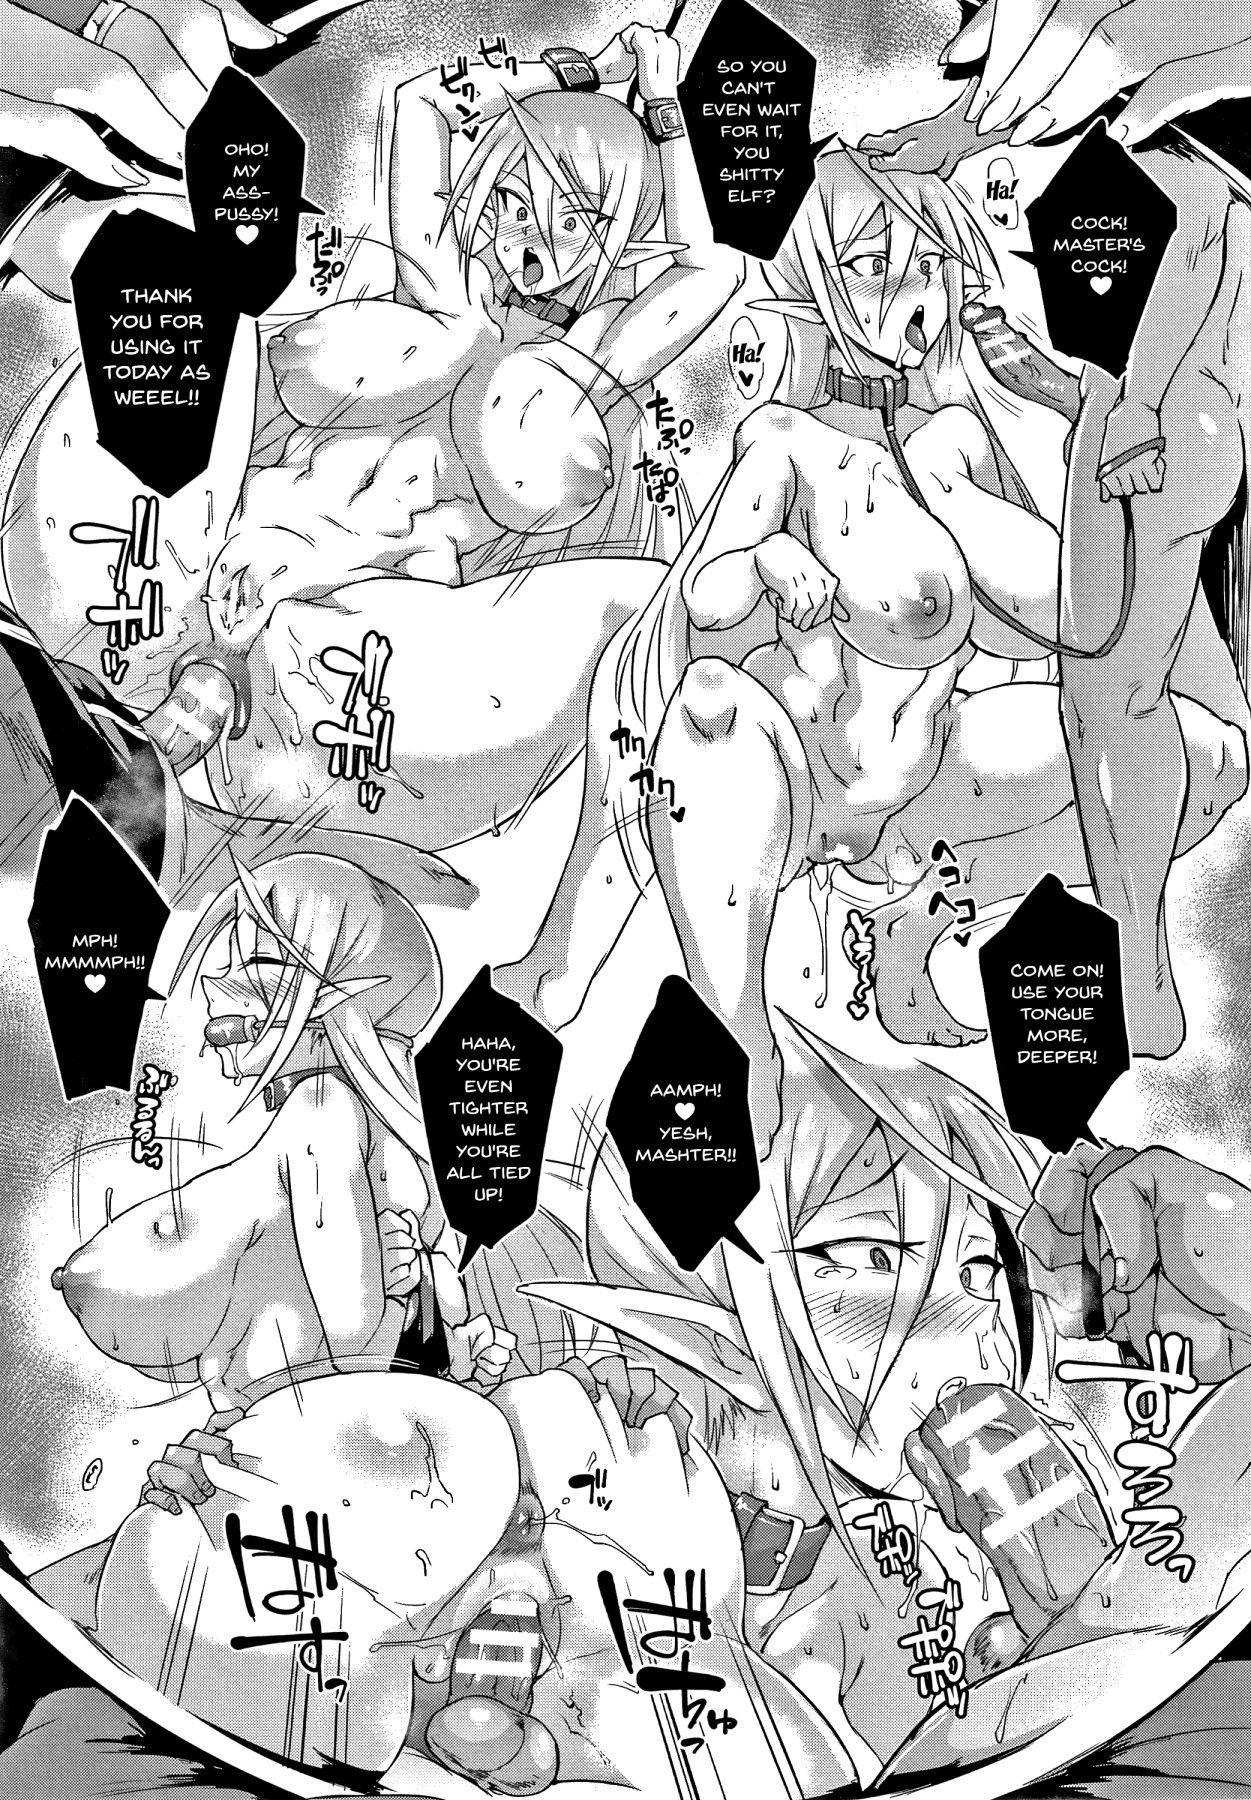 [Fan no Hitori] Sennen Reijou ~ My Lady, My Master ~  Ch.1-2 [English] {Doujins.com} 35